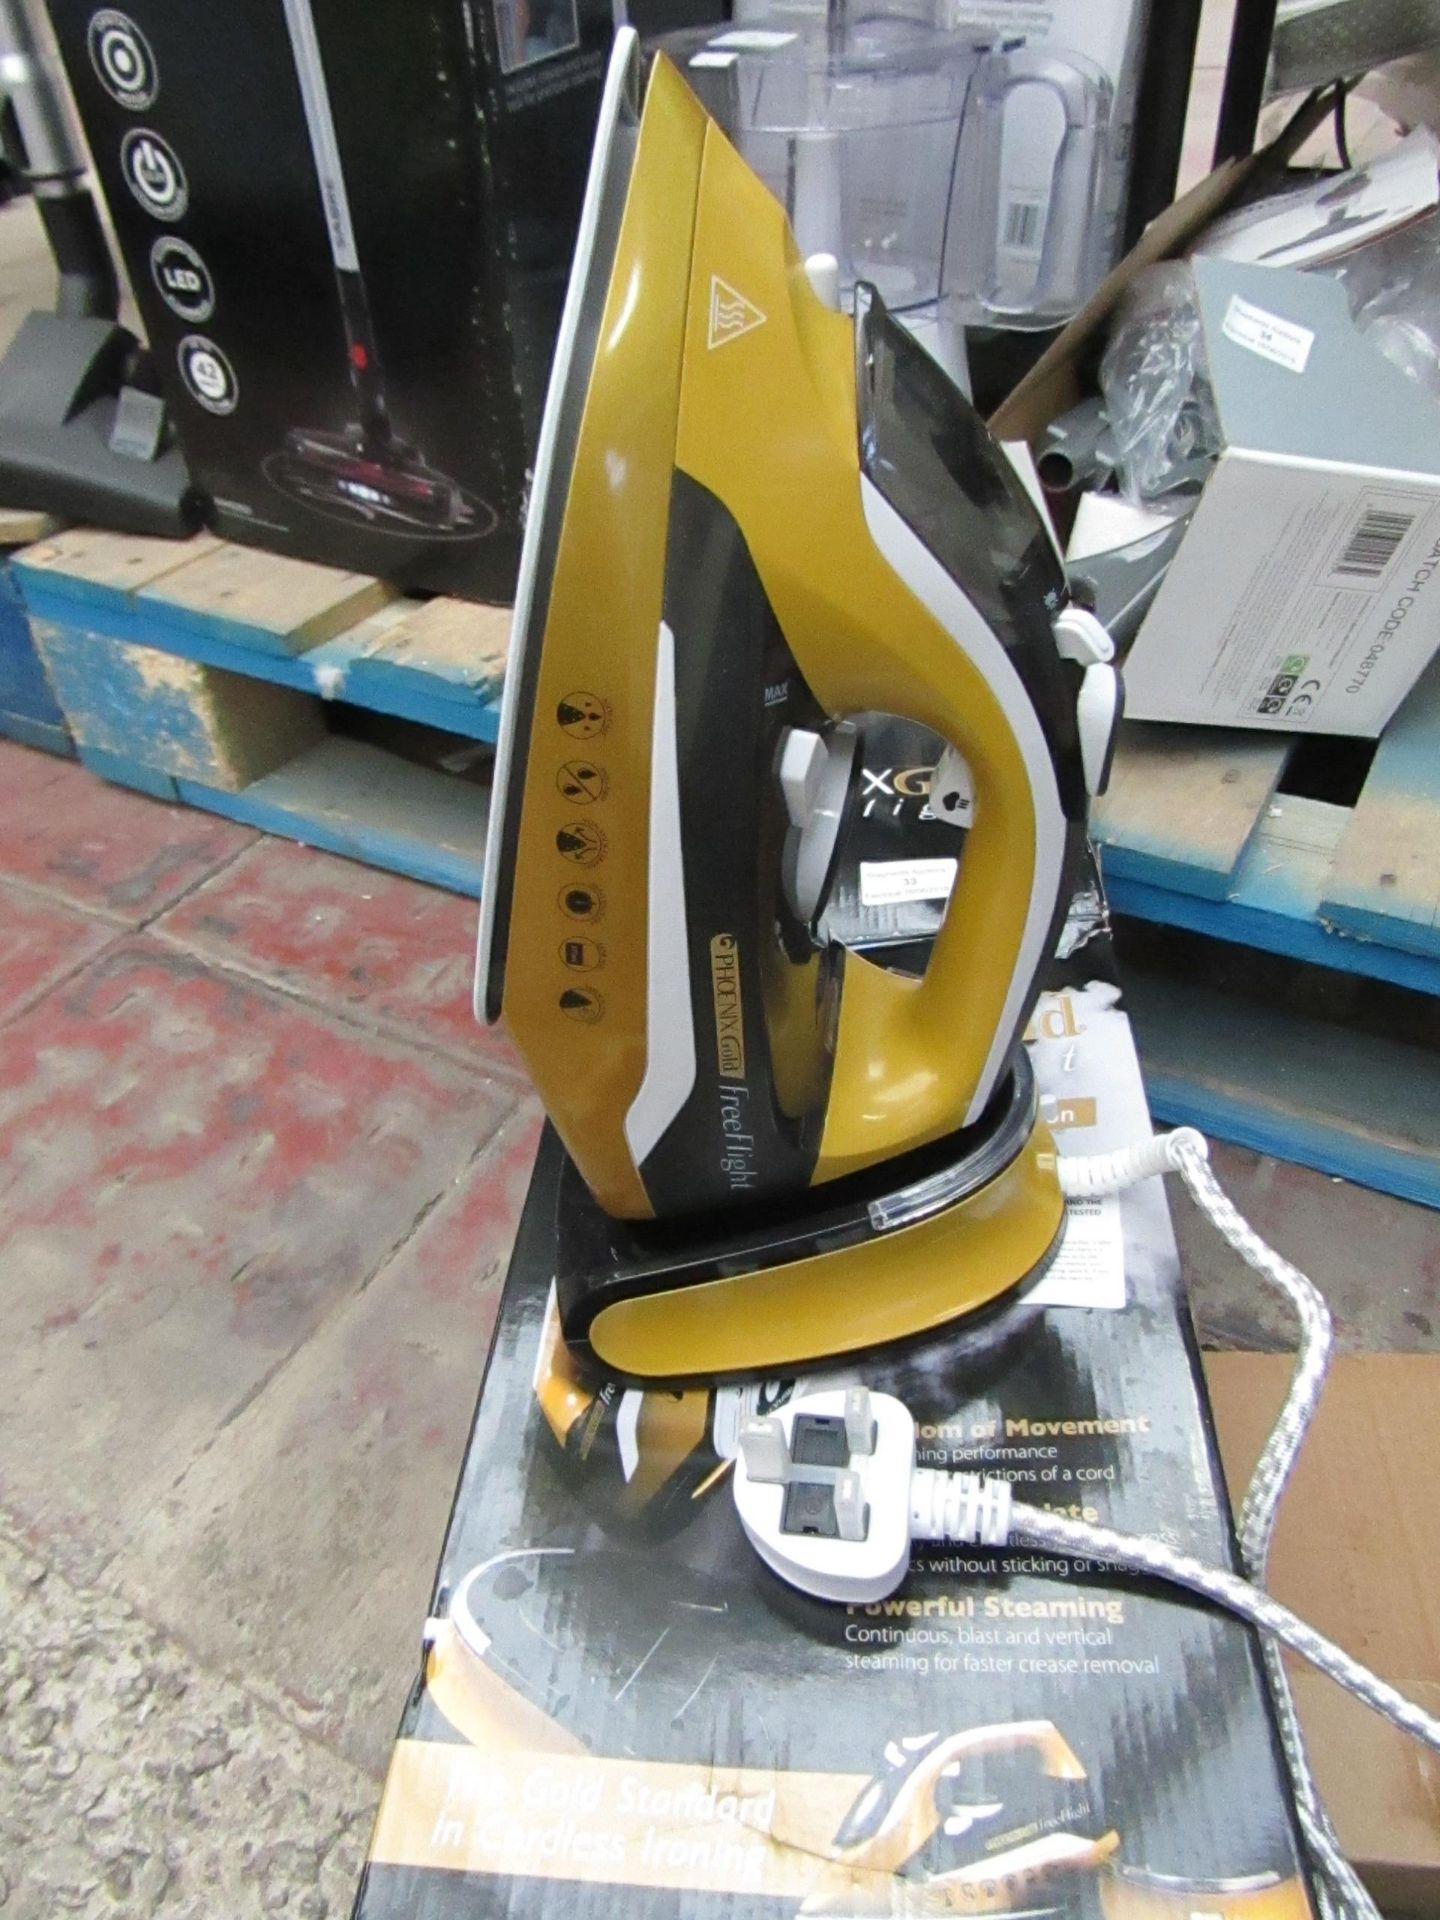 Lot 33 - JML Phoenix Gold Free Flight cordless steam iron, powers on and boxed.